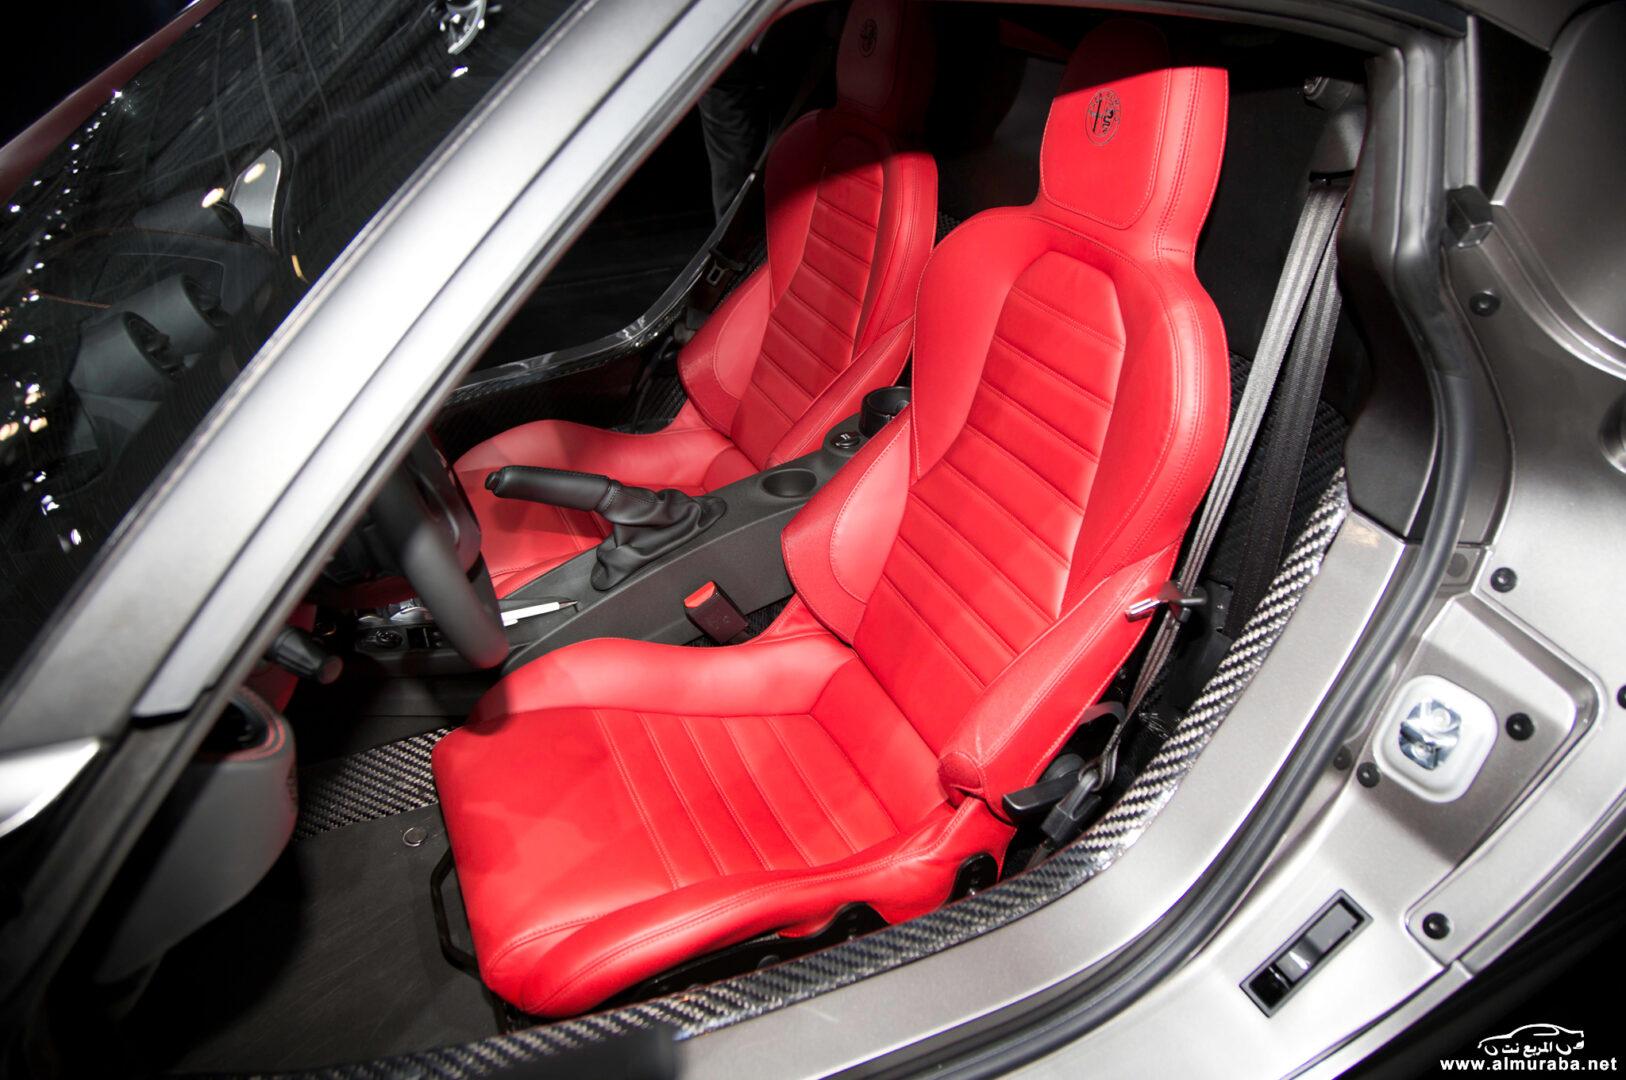 http---image.motortrend.com-f-wot-1404_2015_alfa_romeo_4c_launch_edition_arrives_this_june-72848094-2015-Alfa-Romeo-4C-Launch-Edition-interior